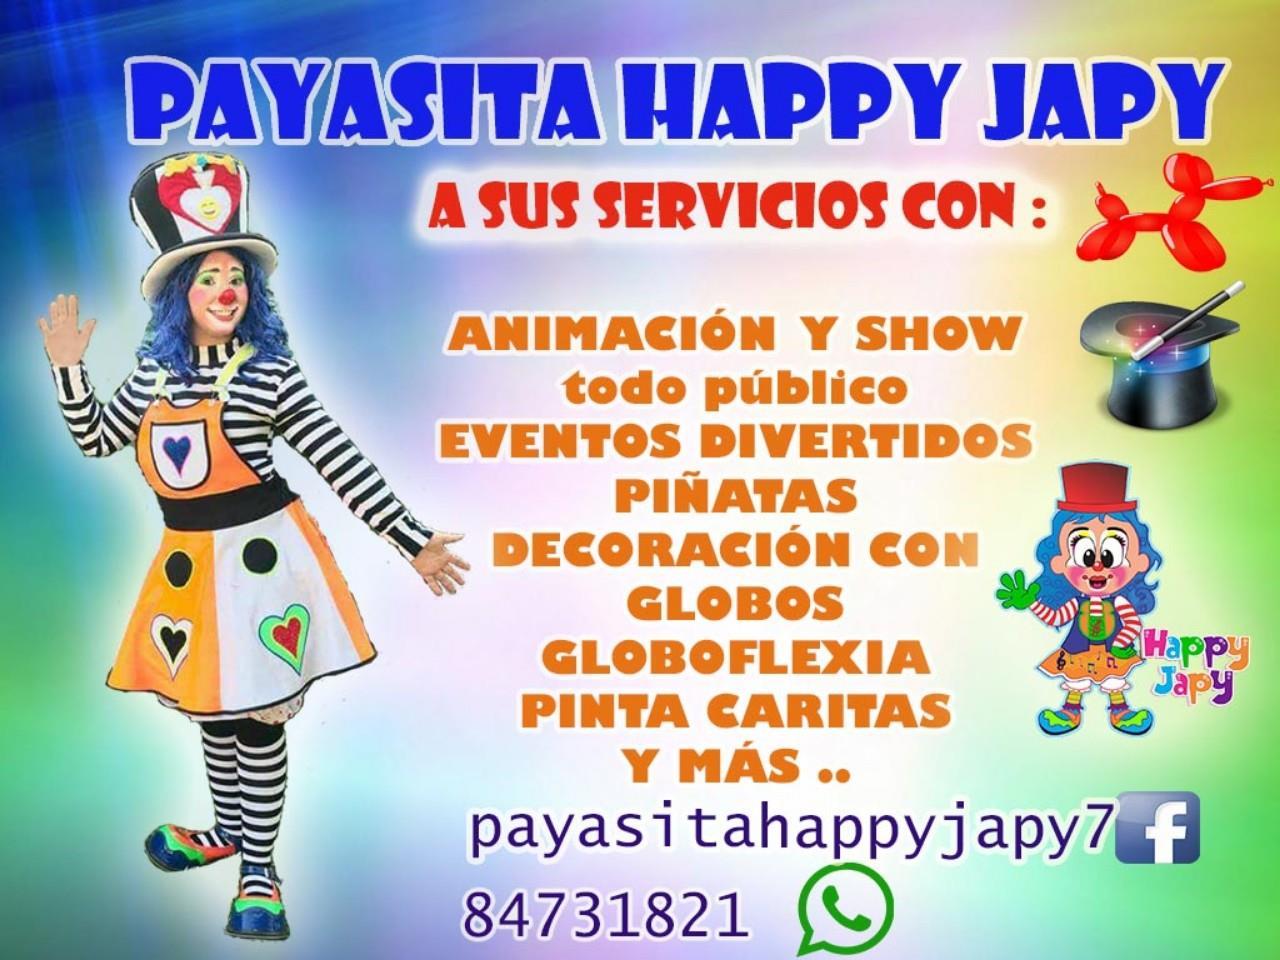 Payasita Happy Japy Guanacaste Costa Rica